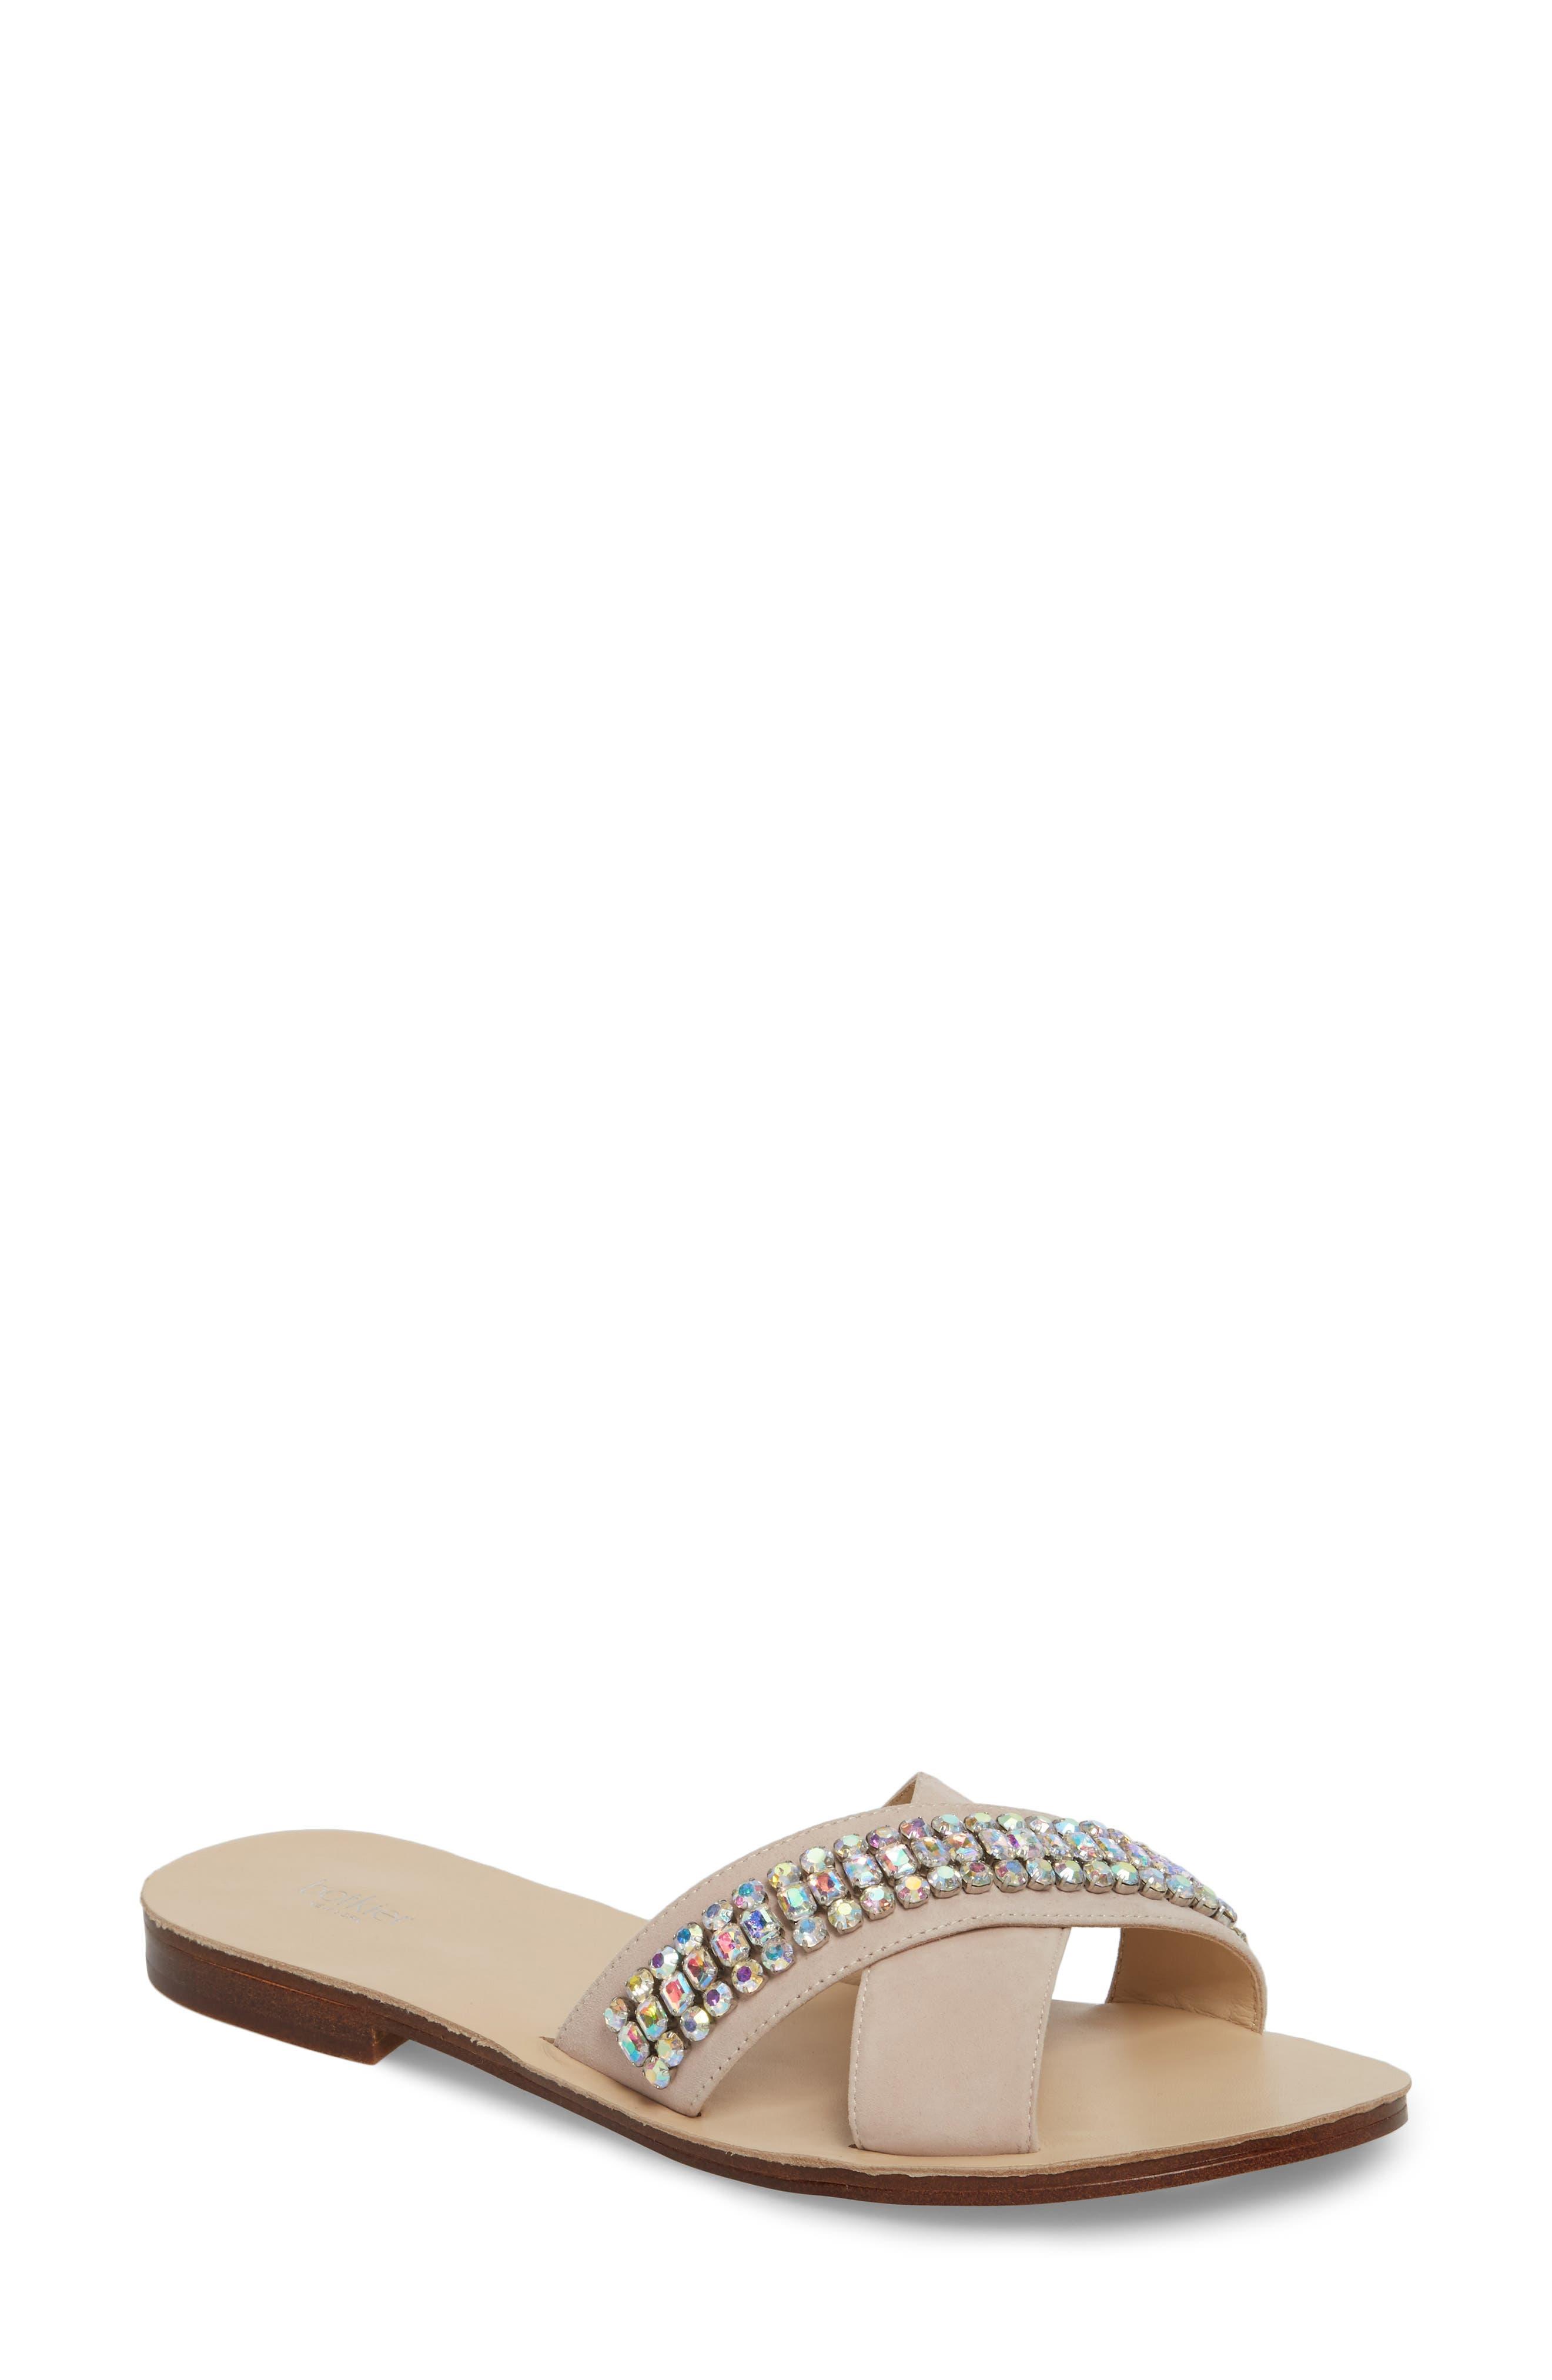 Alana Slide Sandal,                         Main,                         color, Blush Stone Suede